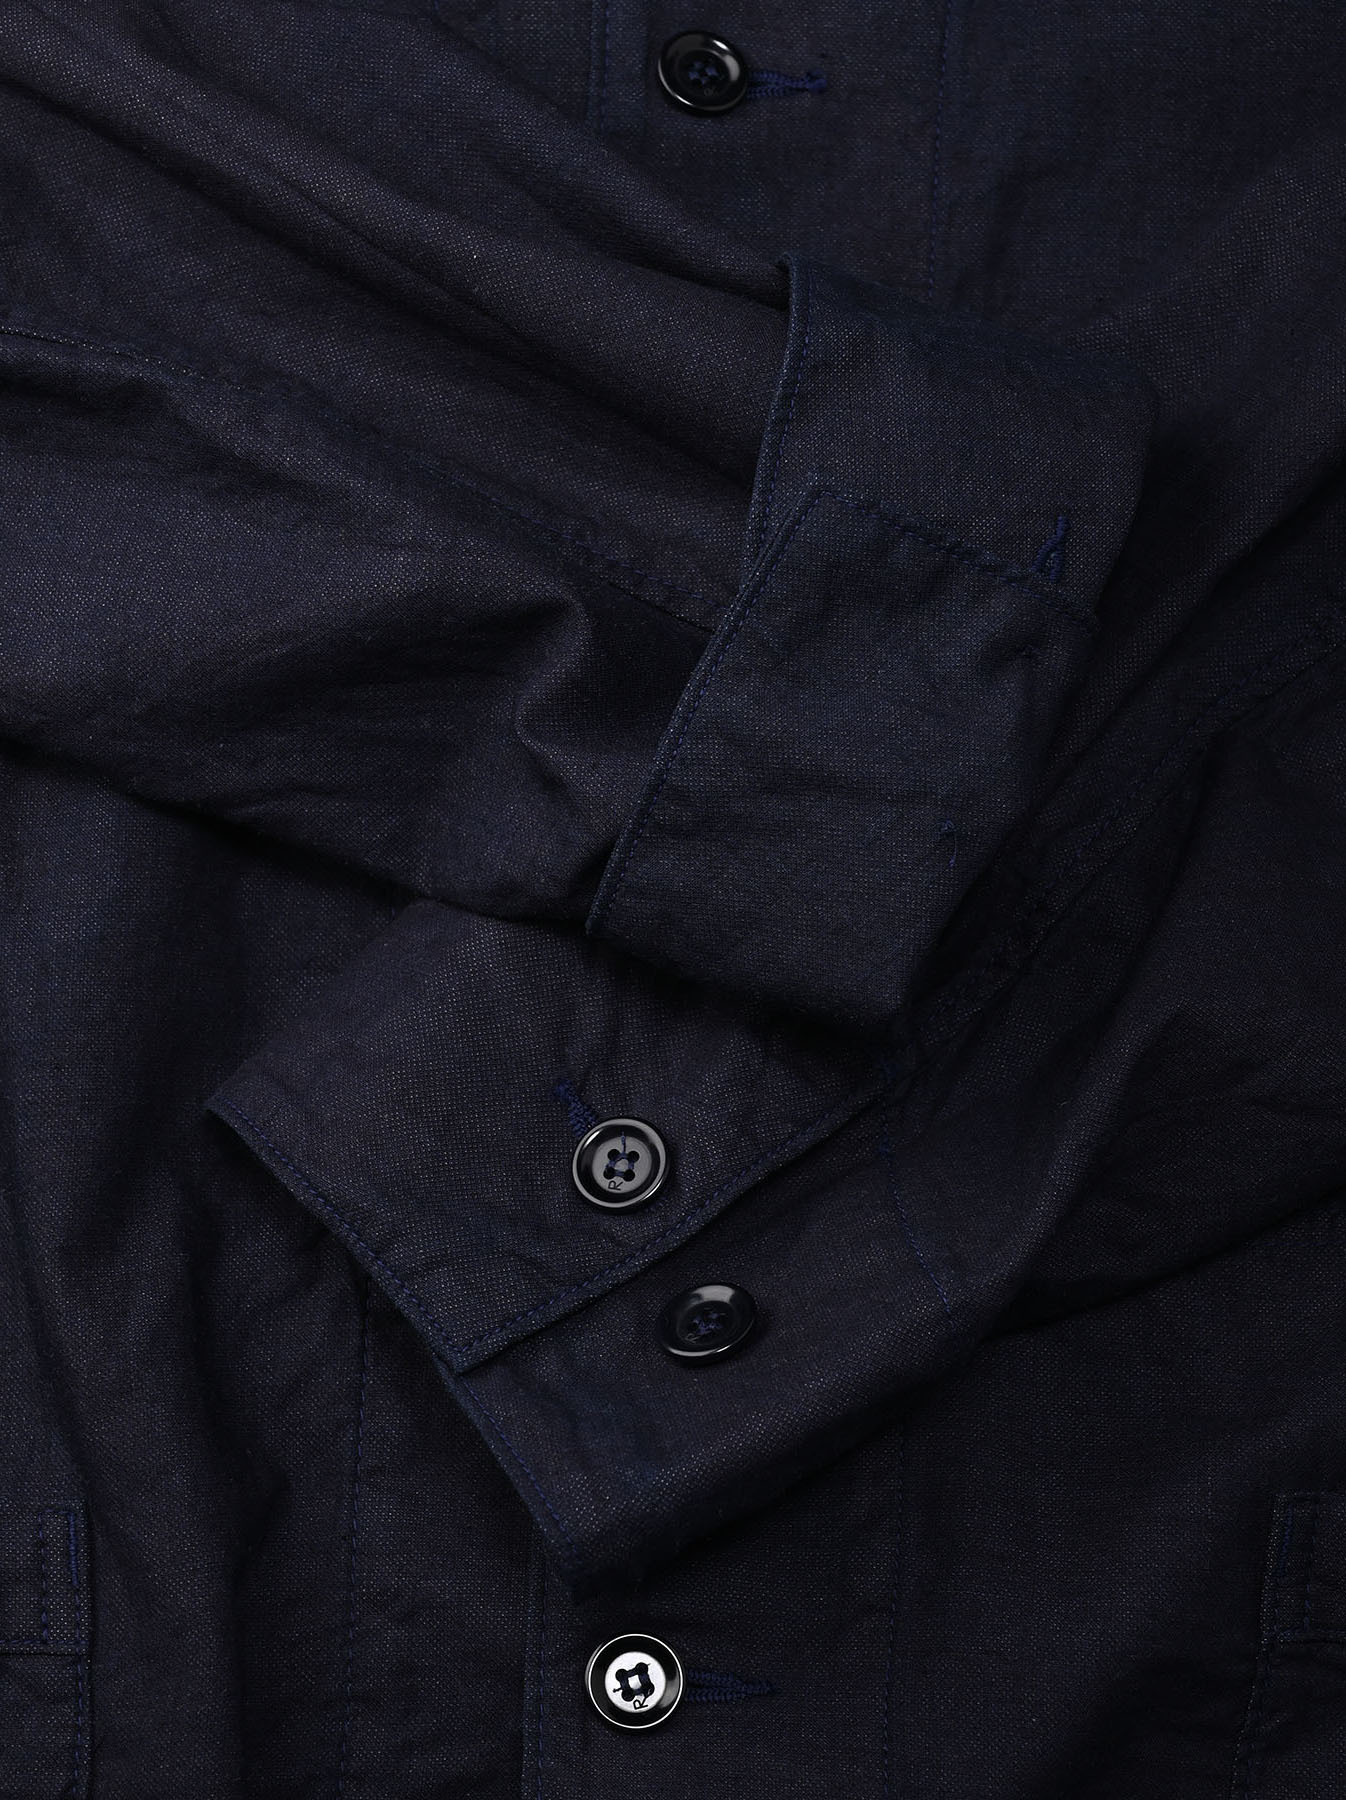 Indigo Double Woven 908 Shirt Jacket (0421)-11